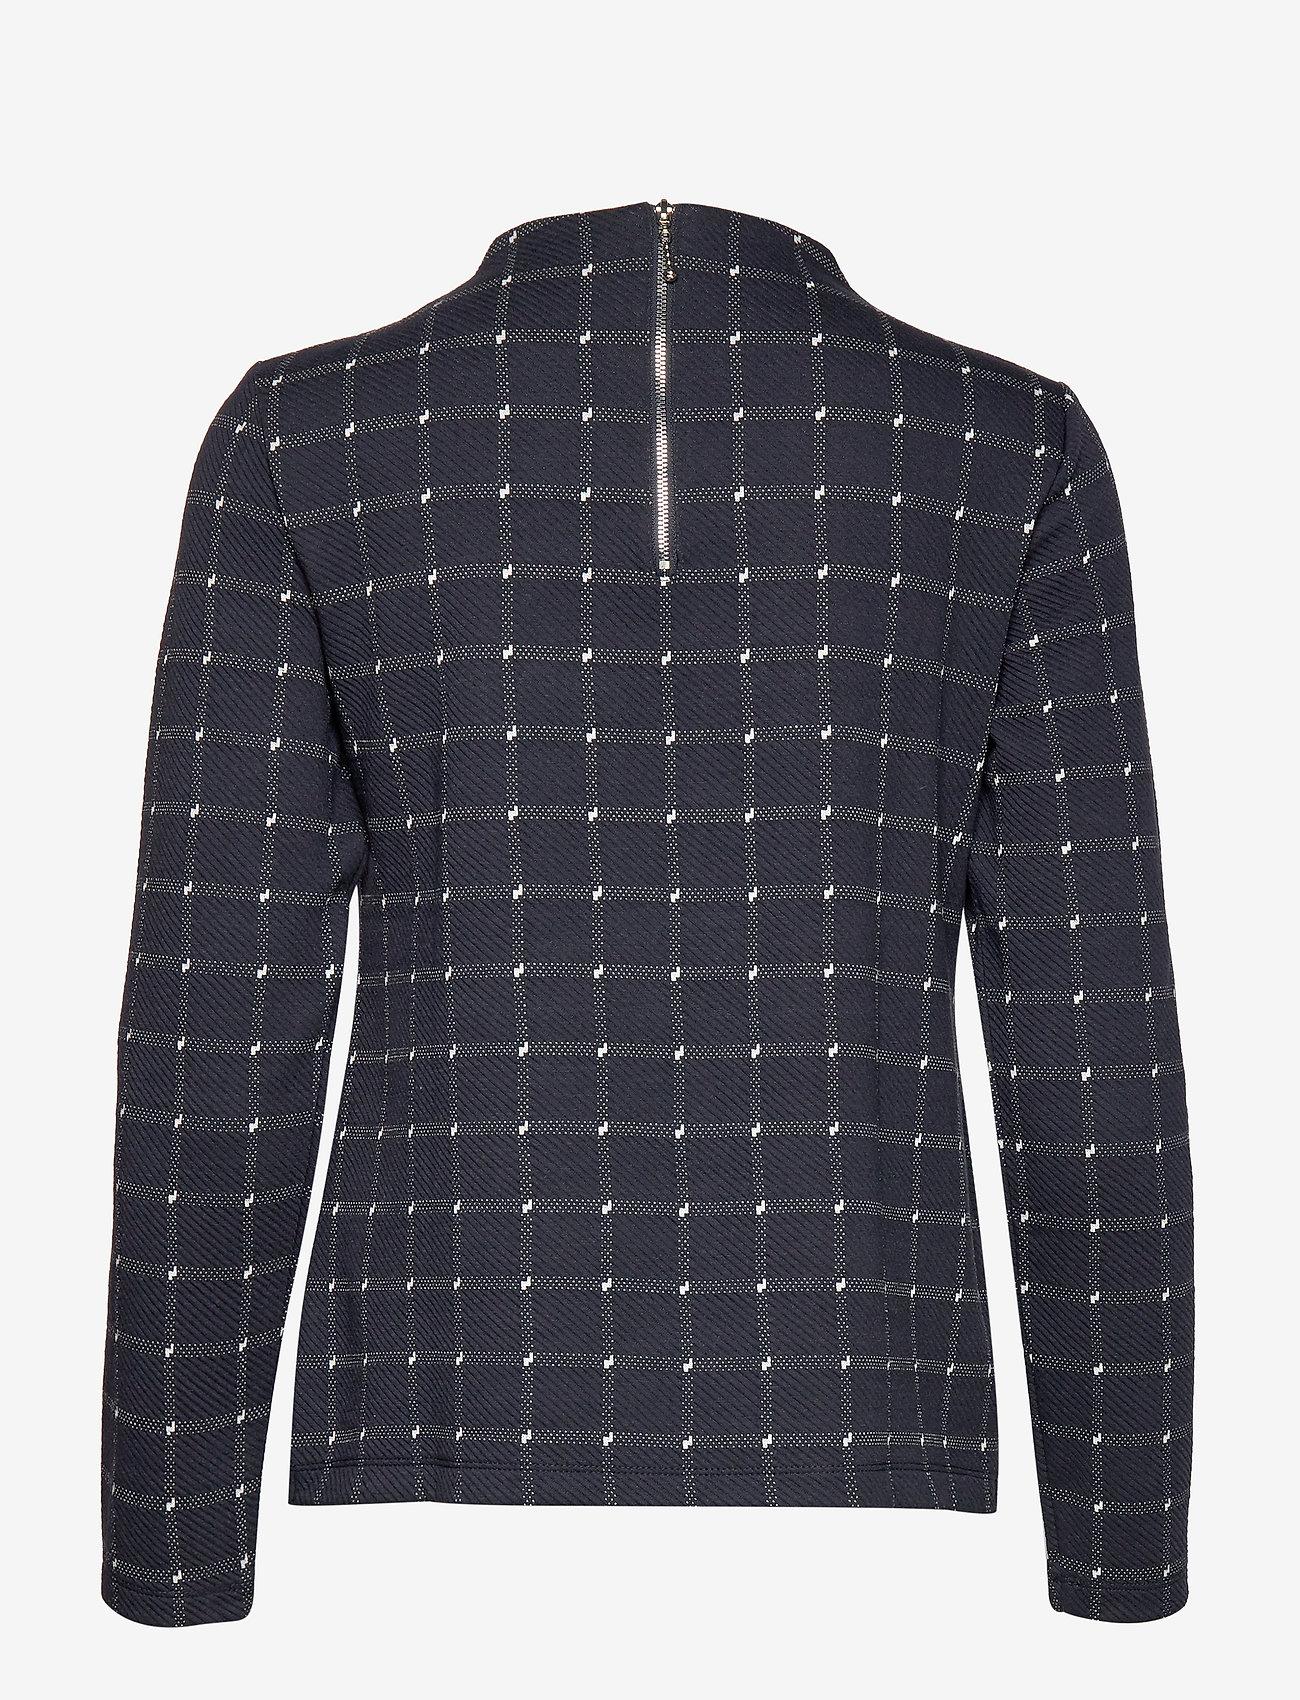 T-shirt Long-sleeve (Navy Patternd) - Taifun JJUxiT